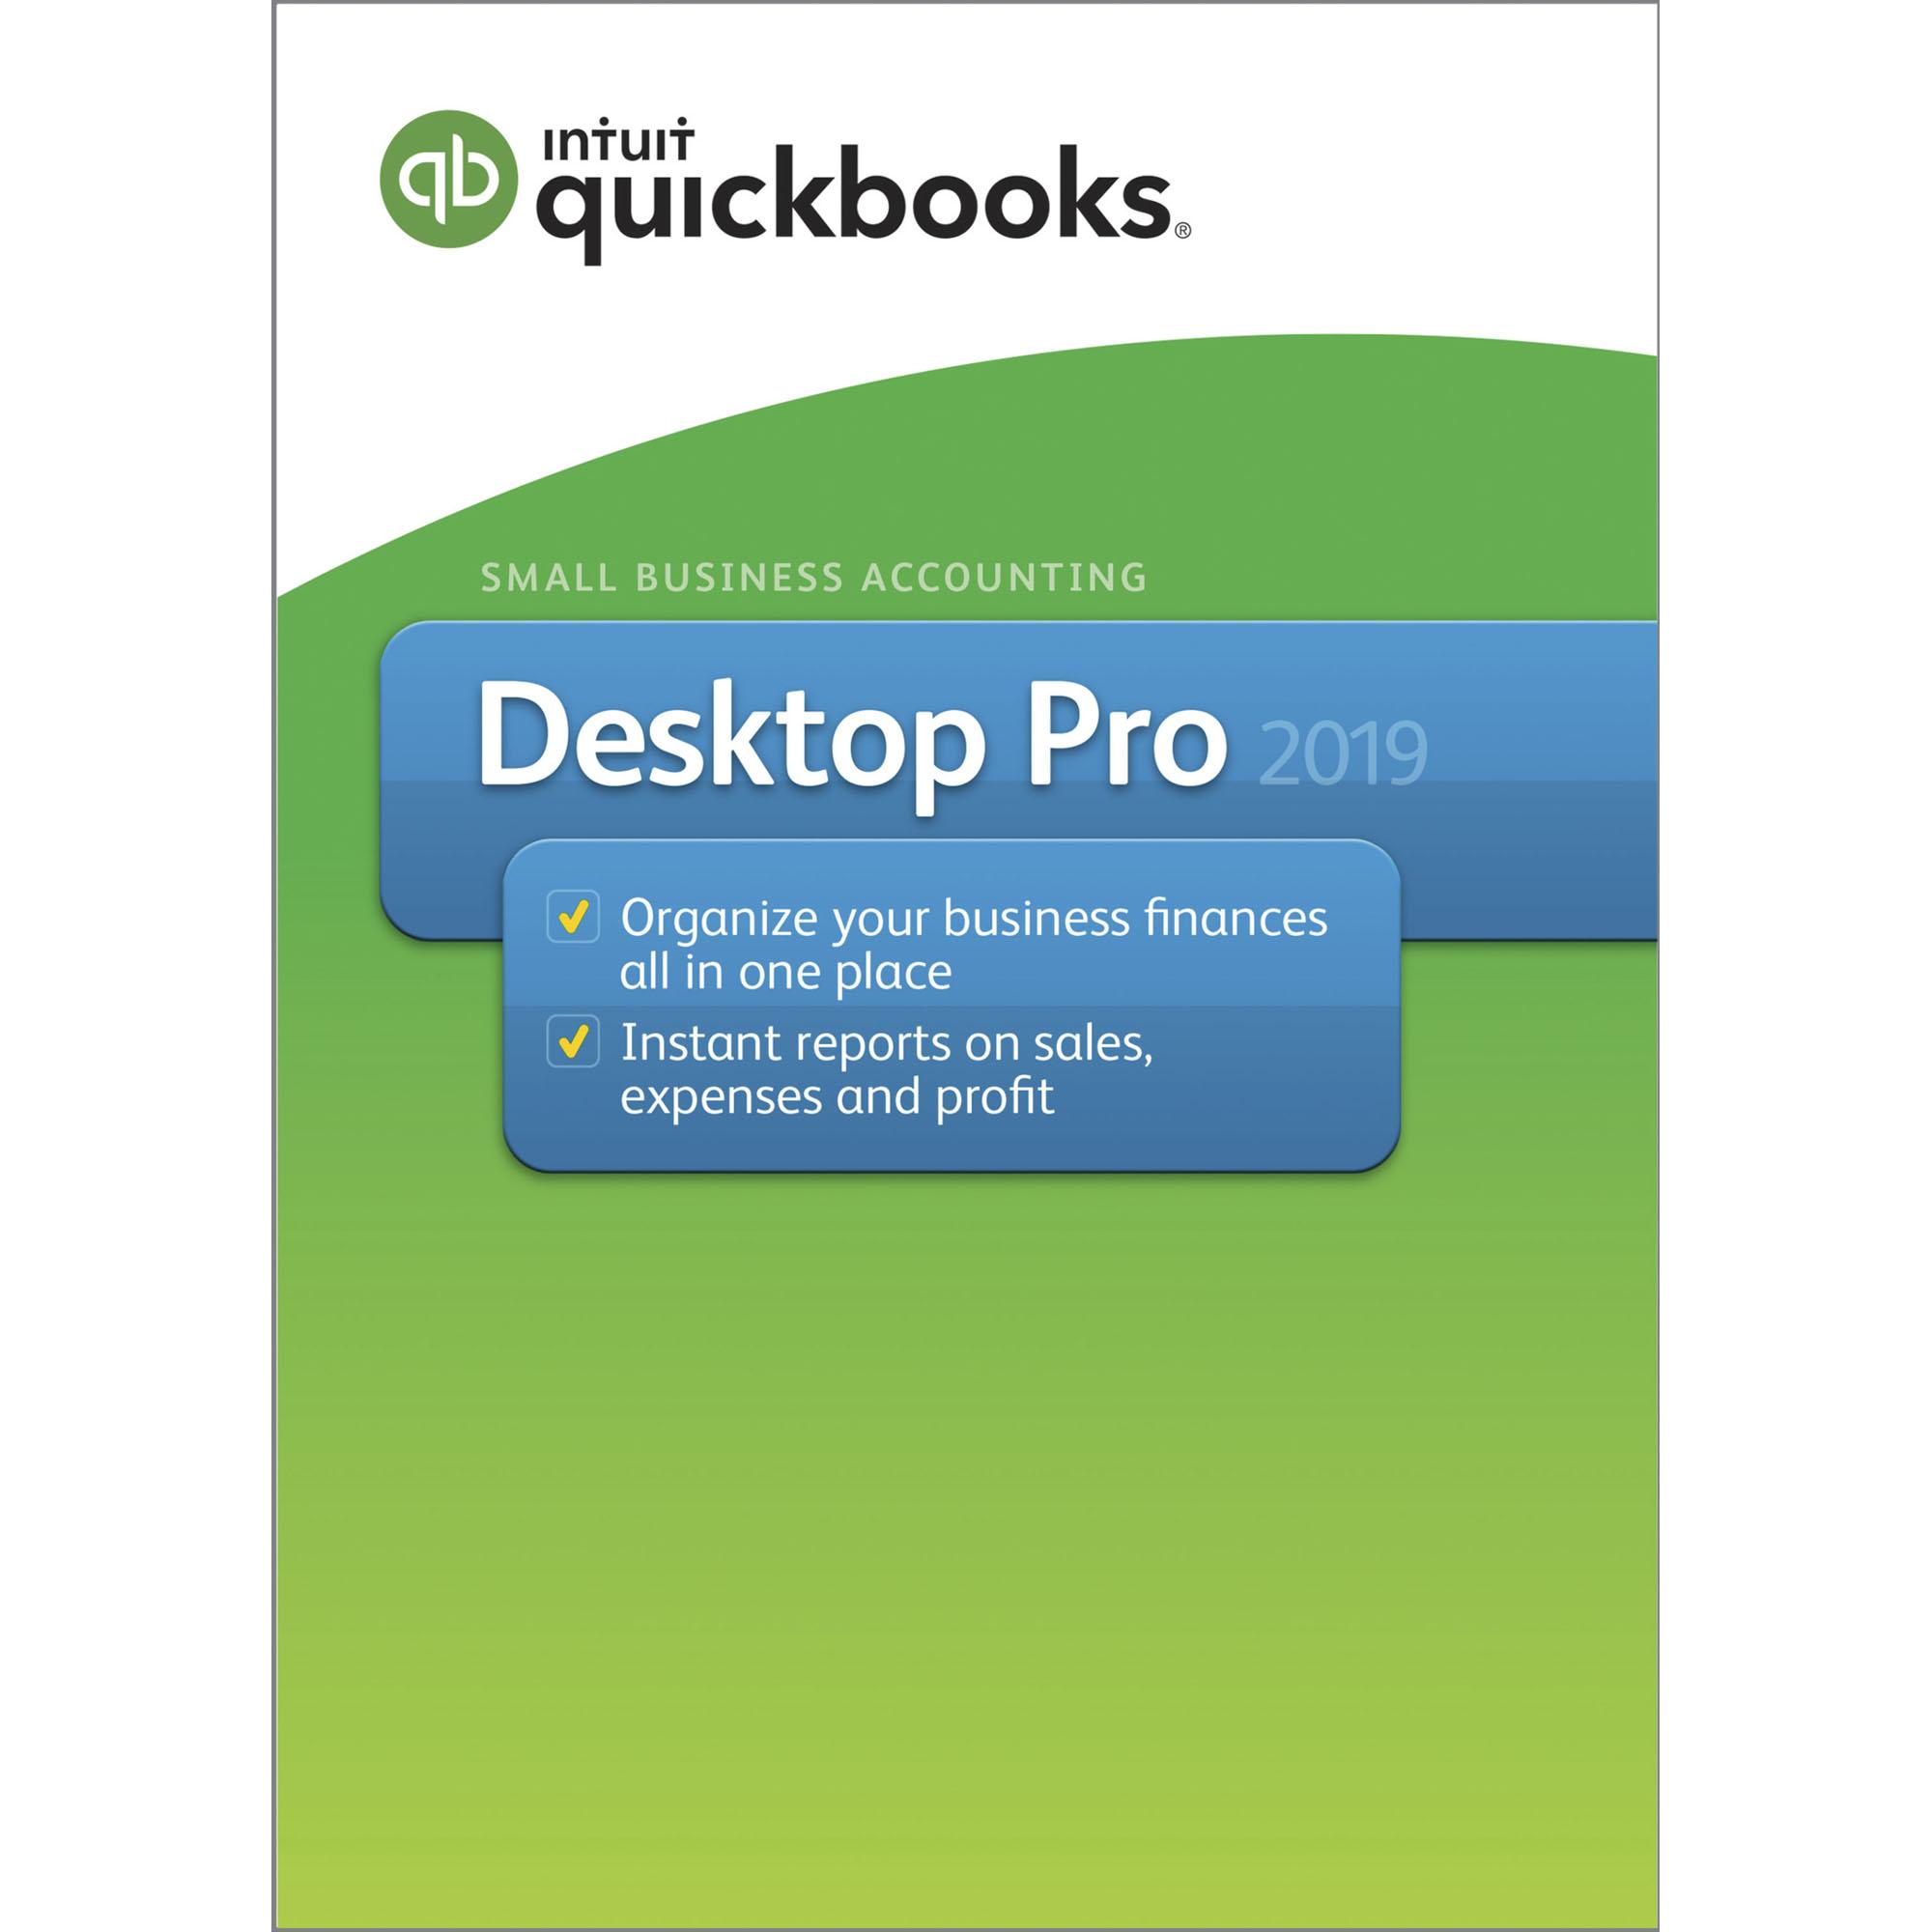 Intuit QuickBooks Desktop Pro 2019 (Email Delivery)